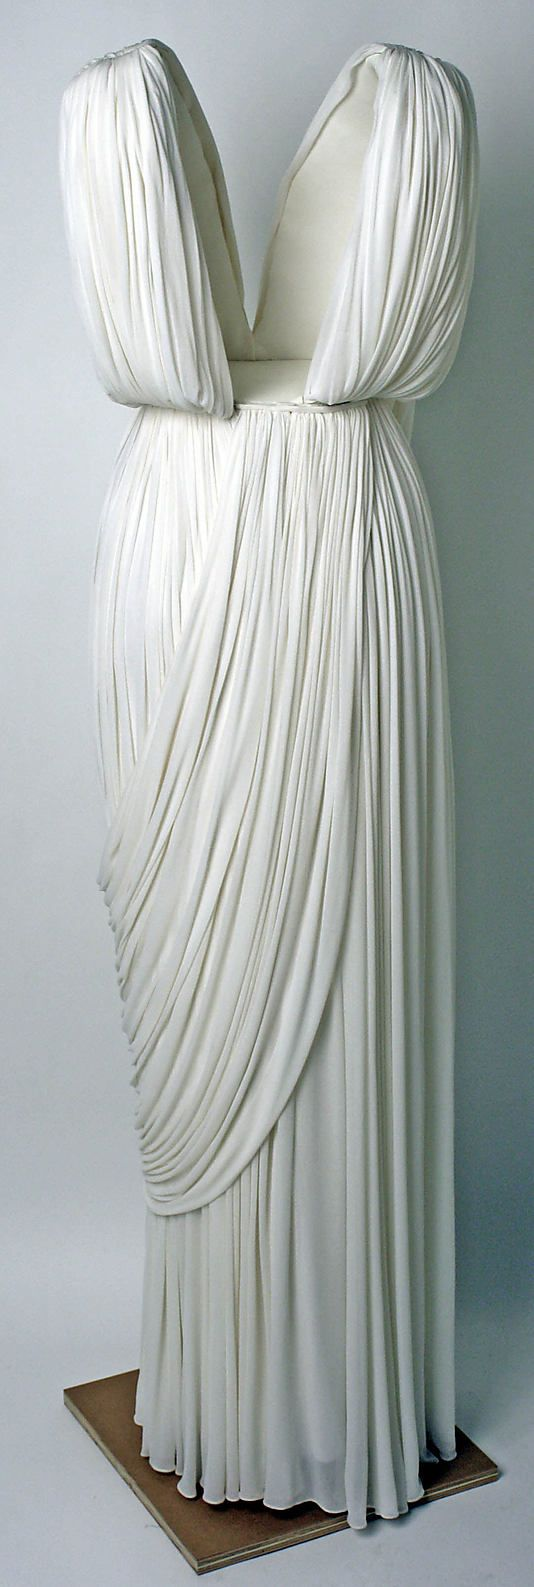 Madame Grès (Alix Barton) | Robe de soirée | français | Le Metropolitan Museum of Art